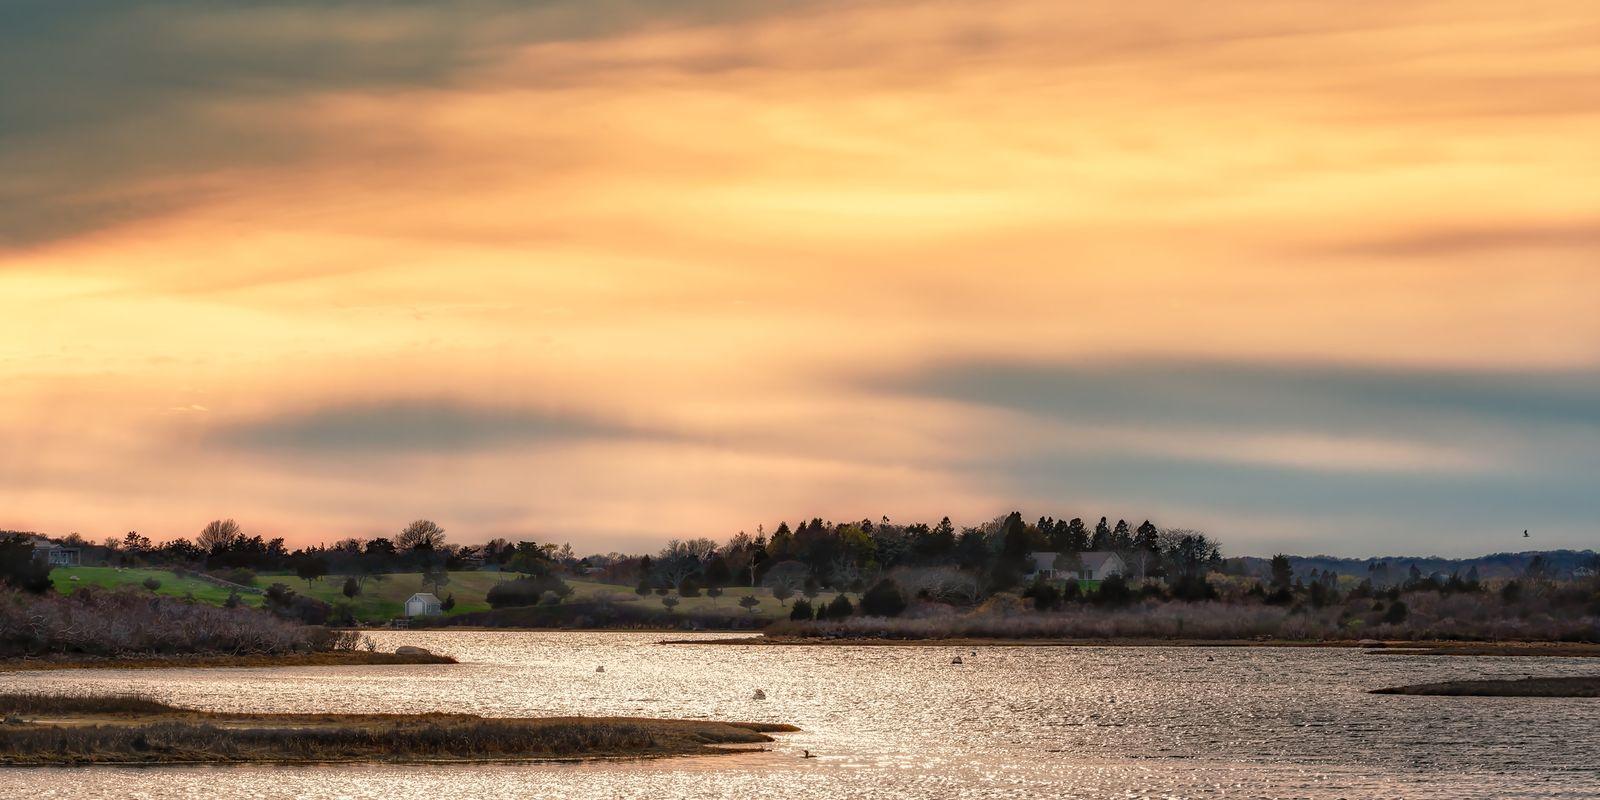 Quitsa Sunset, Chilmark, Martha's Vineyard